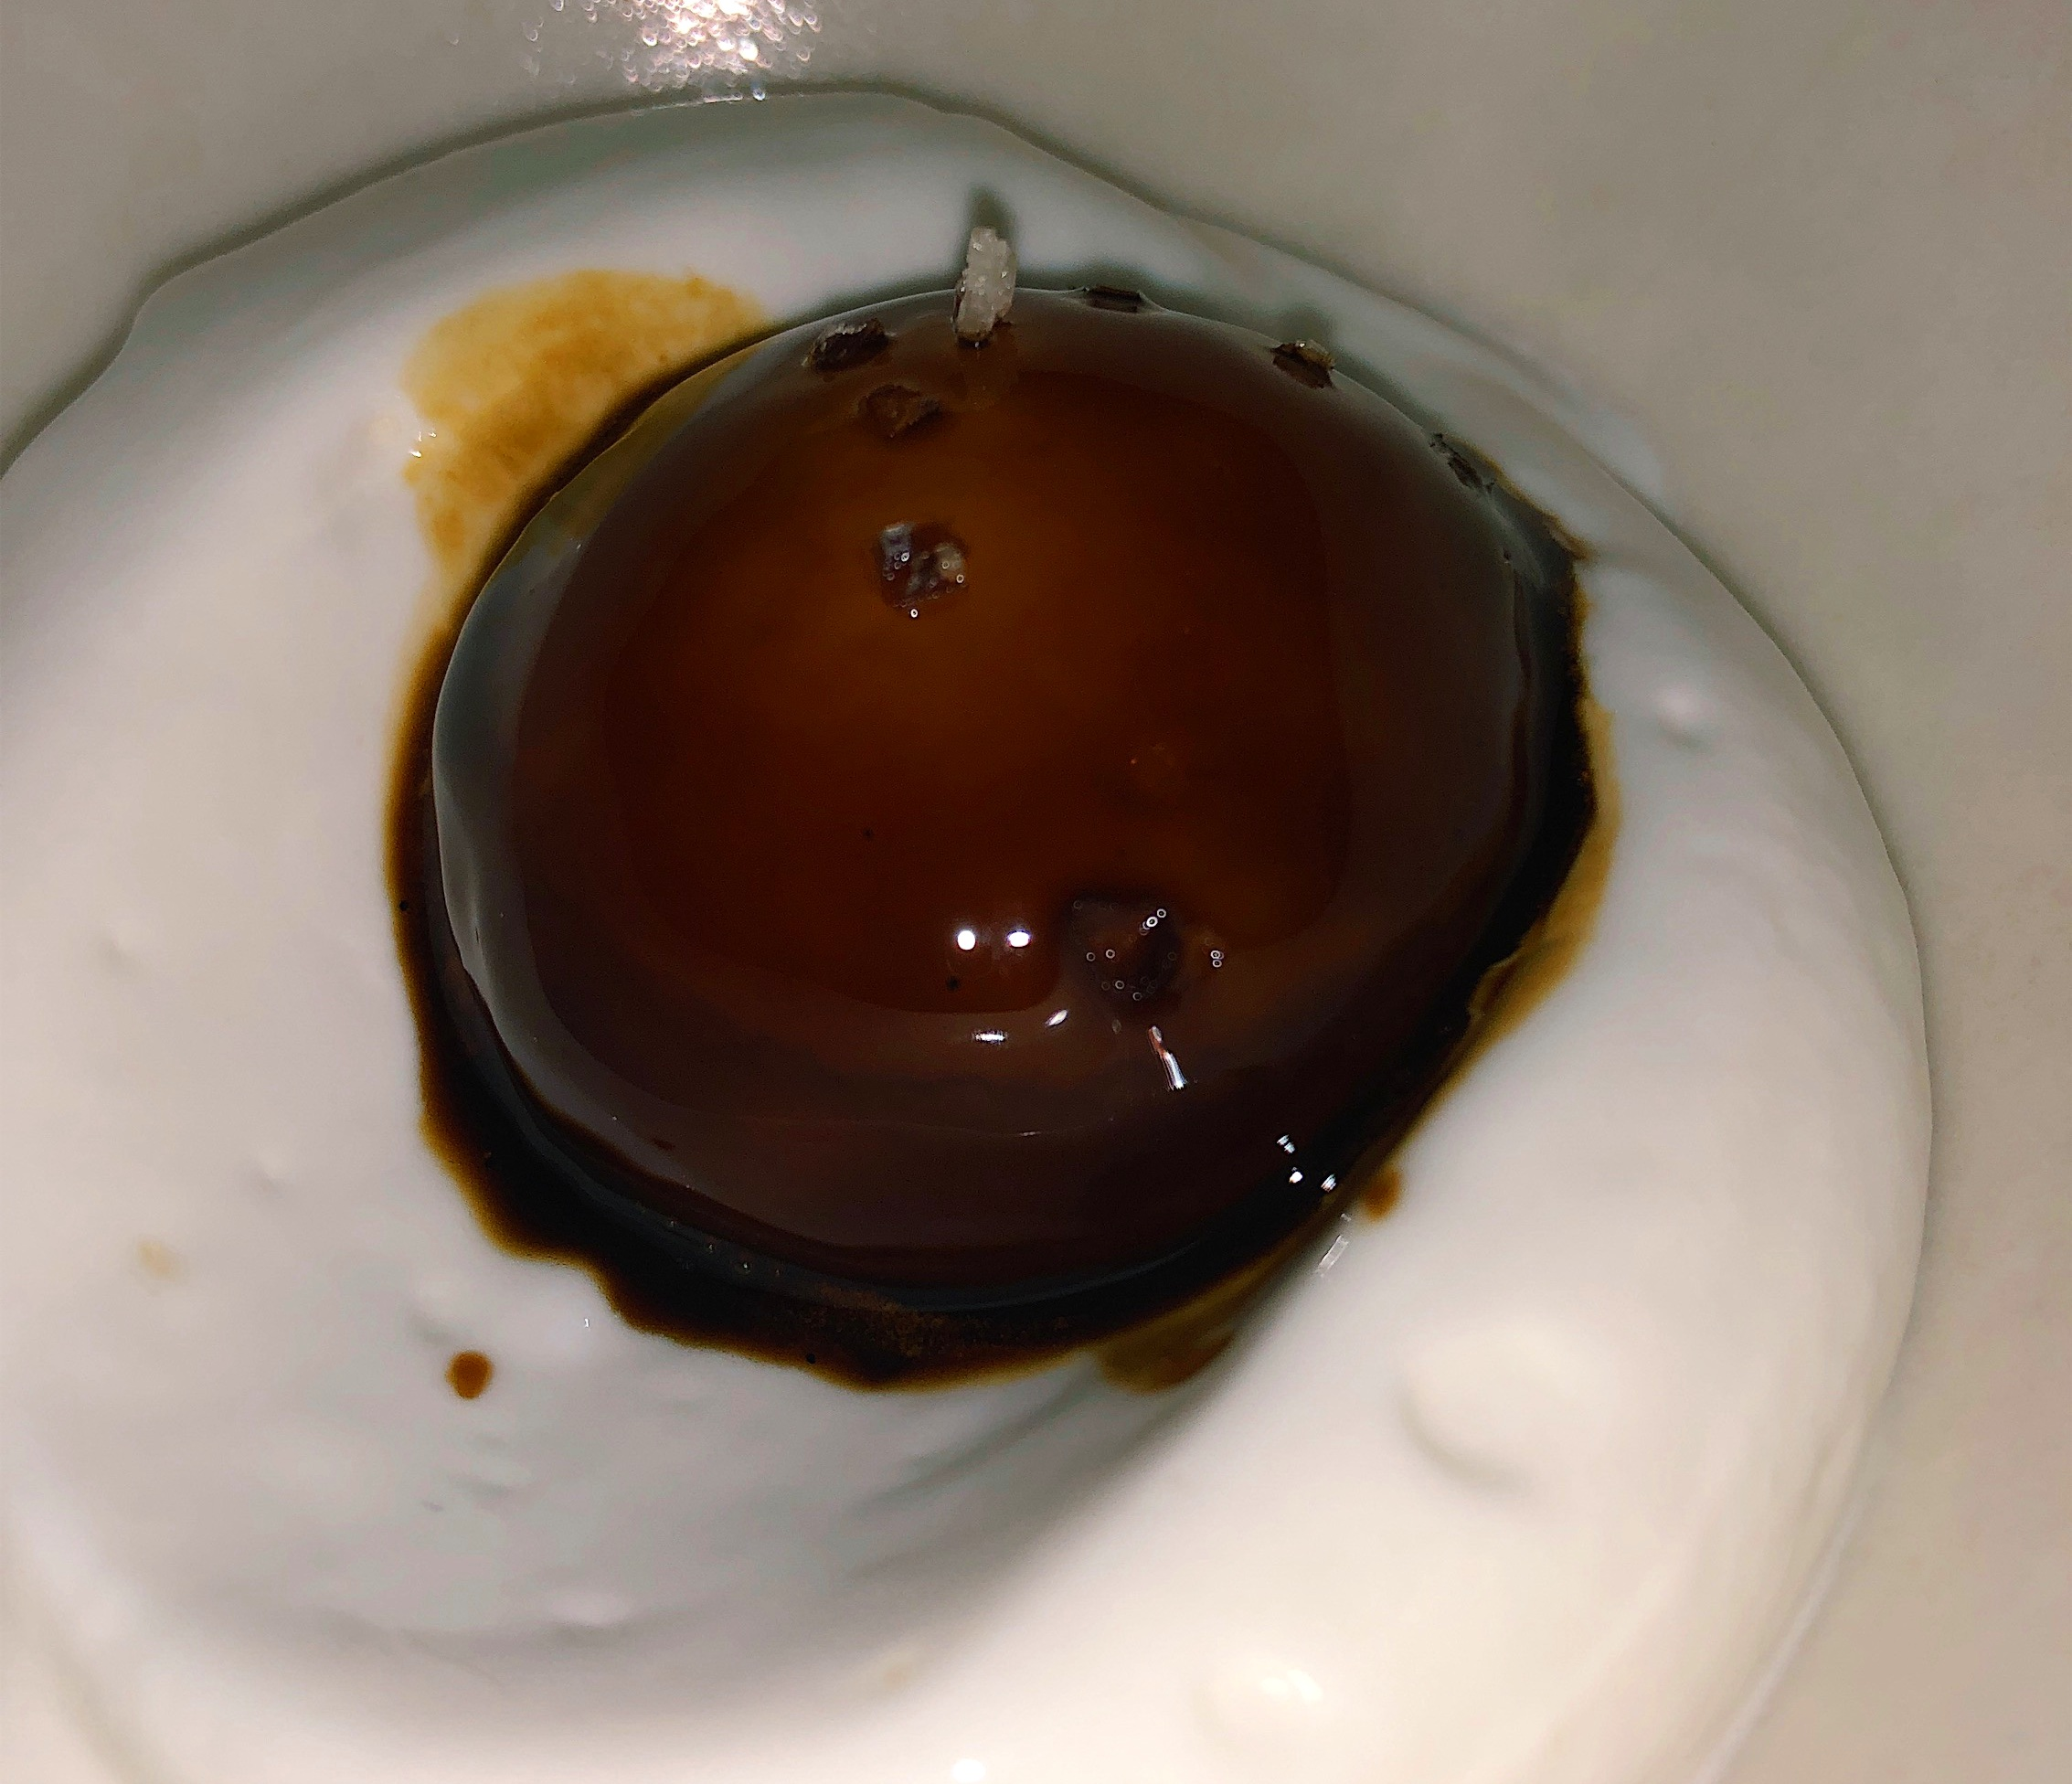 Egg Yolk Soaked in Salted Licorice With Frozen Yogurt Meringue